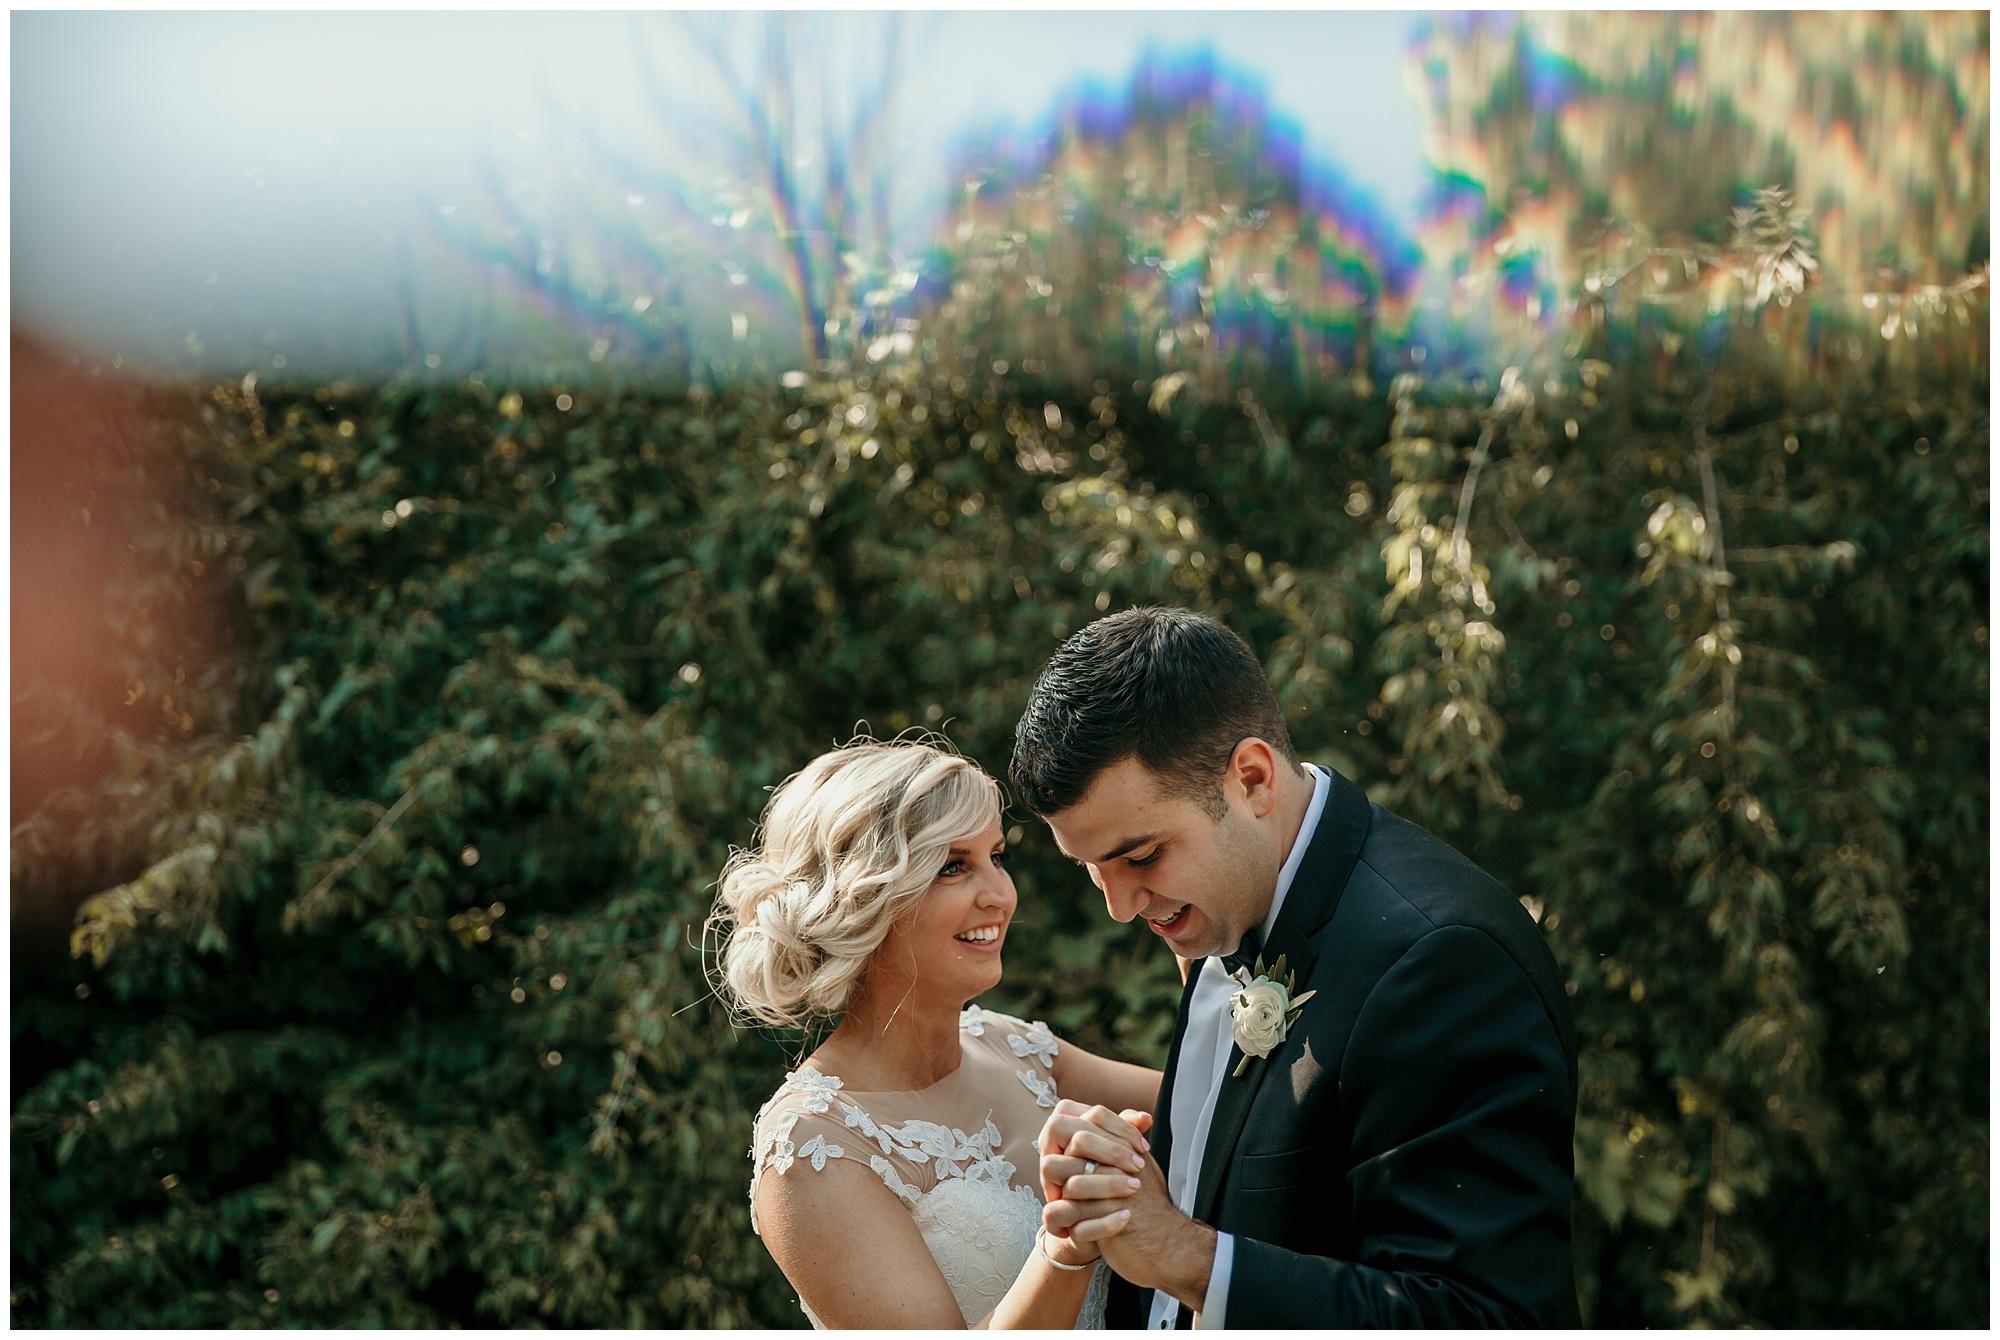 pear_tree_estate_wedding_champaign_il_wright_photographs_jj_0047.jpg